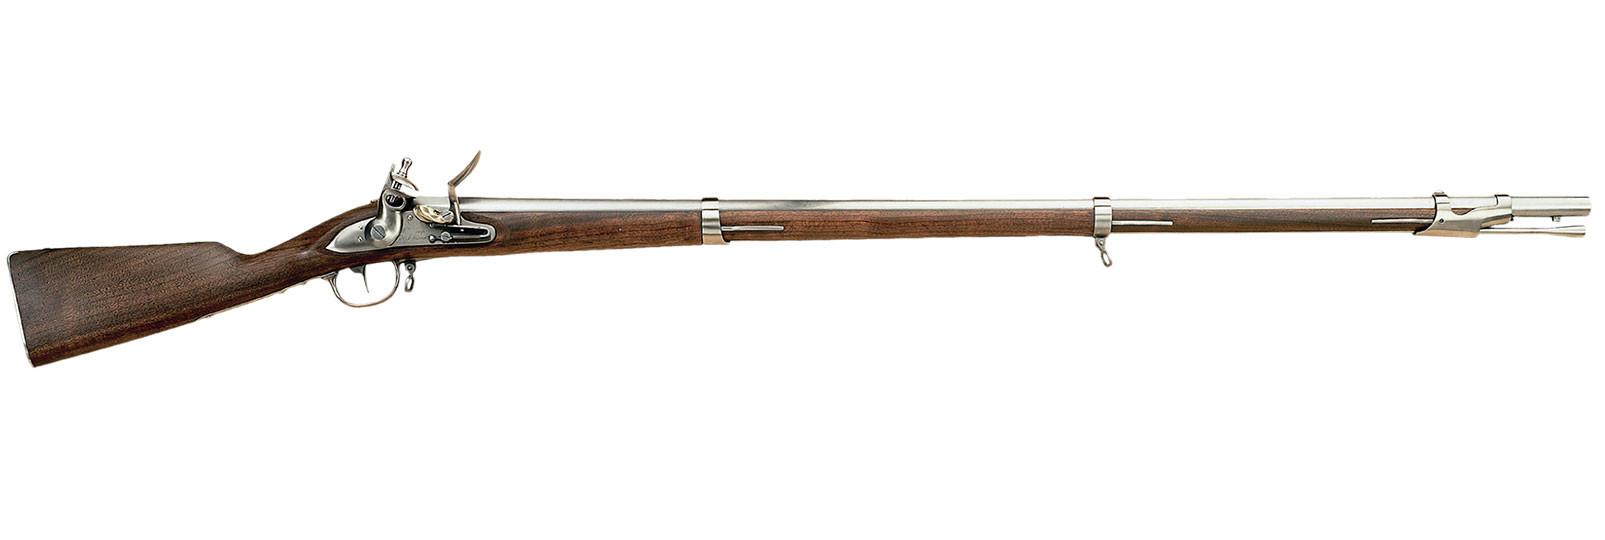 "Fucile 1777 Corrige' ""An IX"""